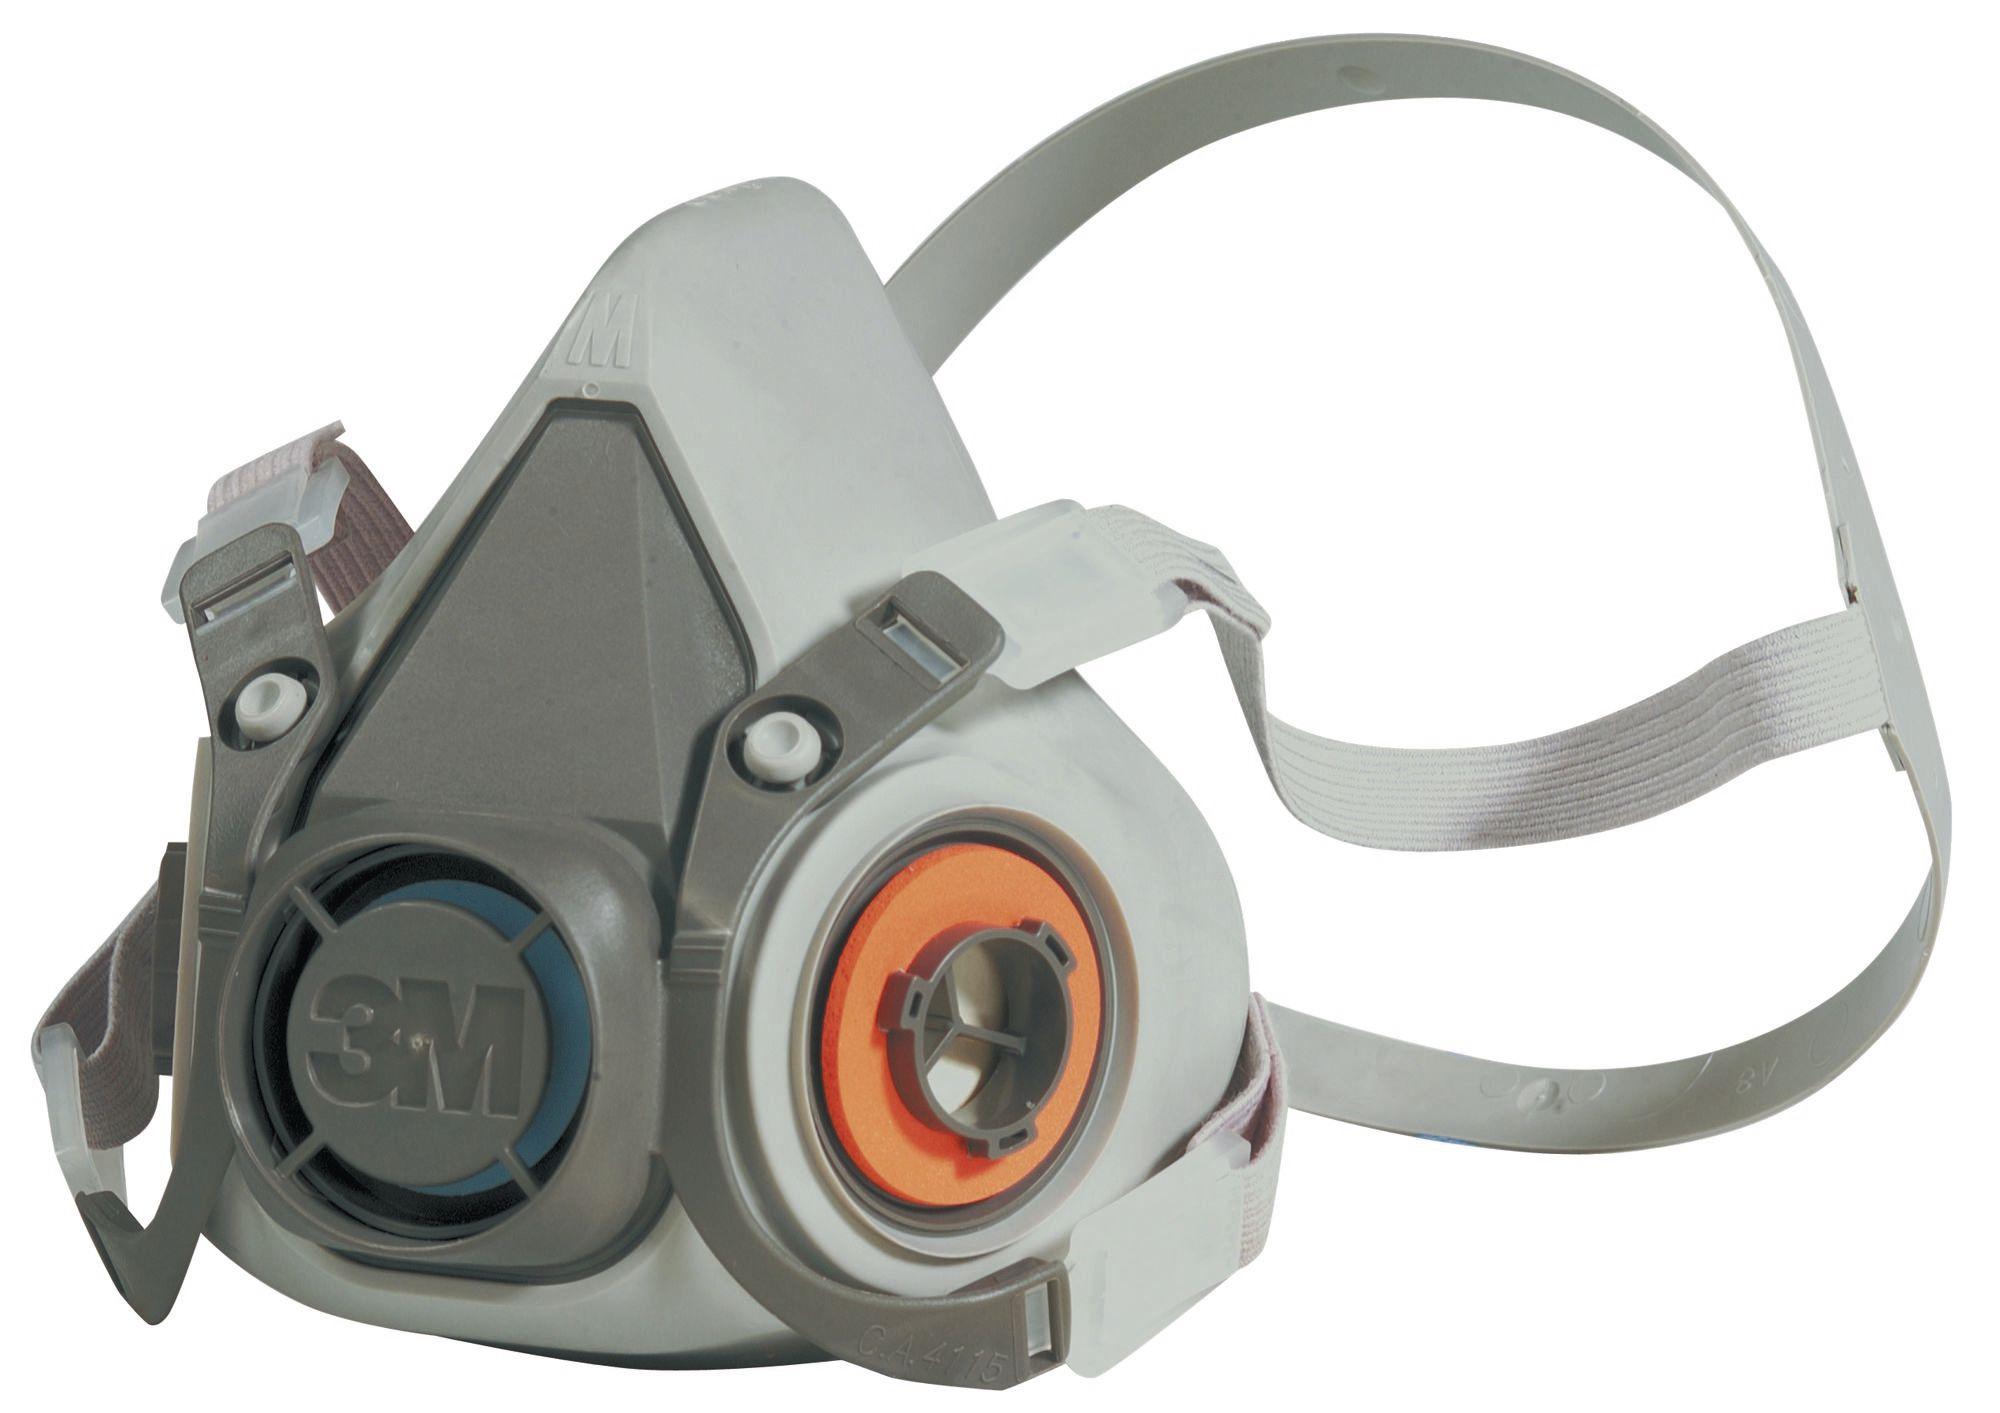 Semimasca protectie respiratorie 3M seria 6000